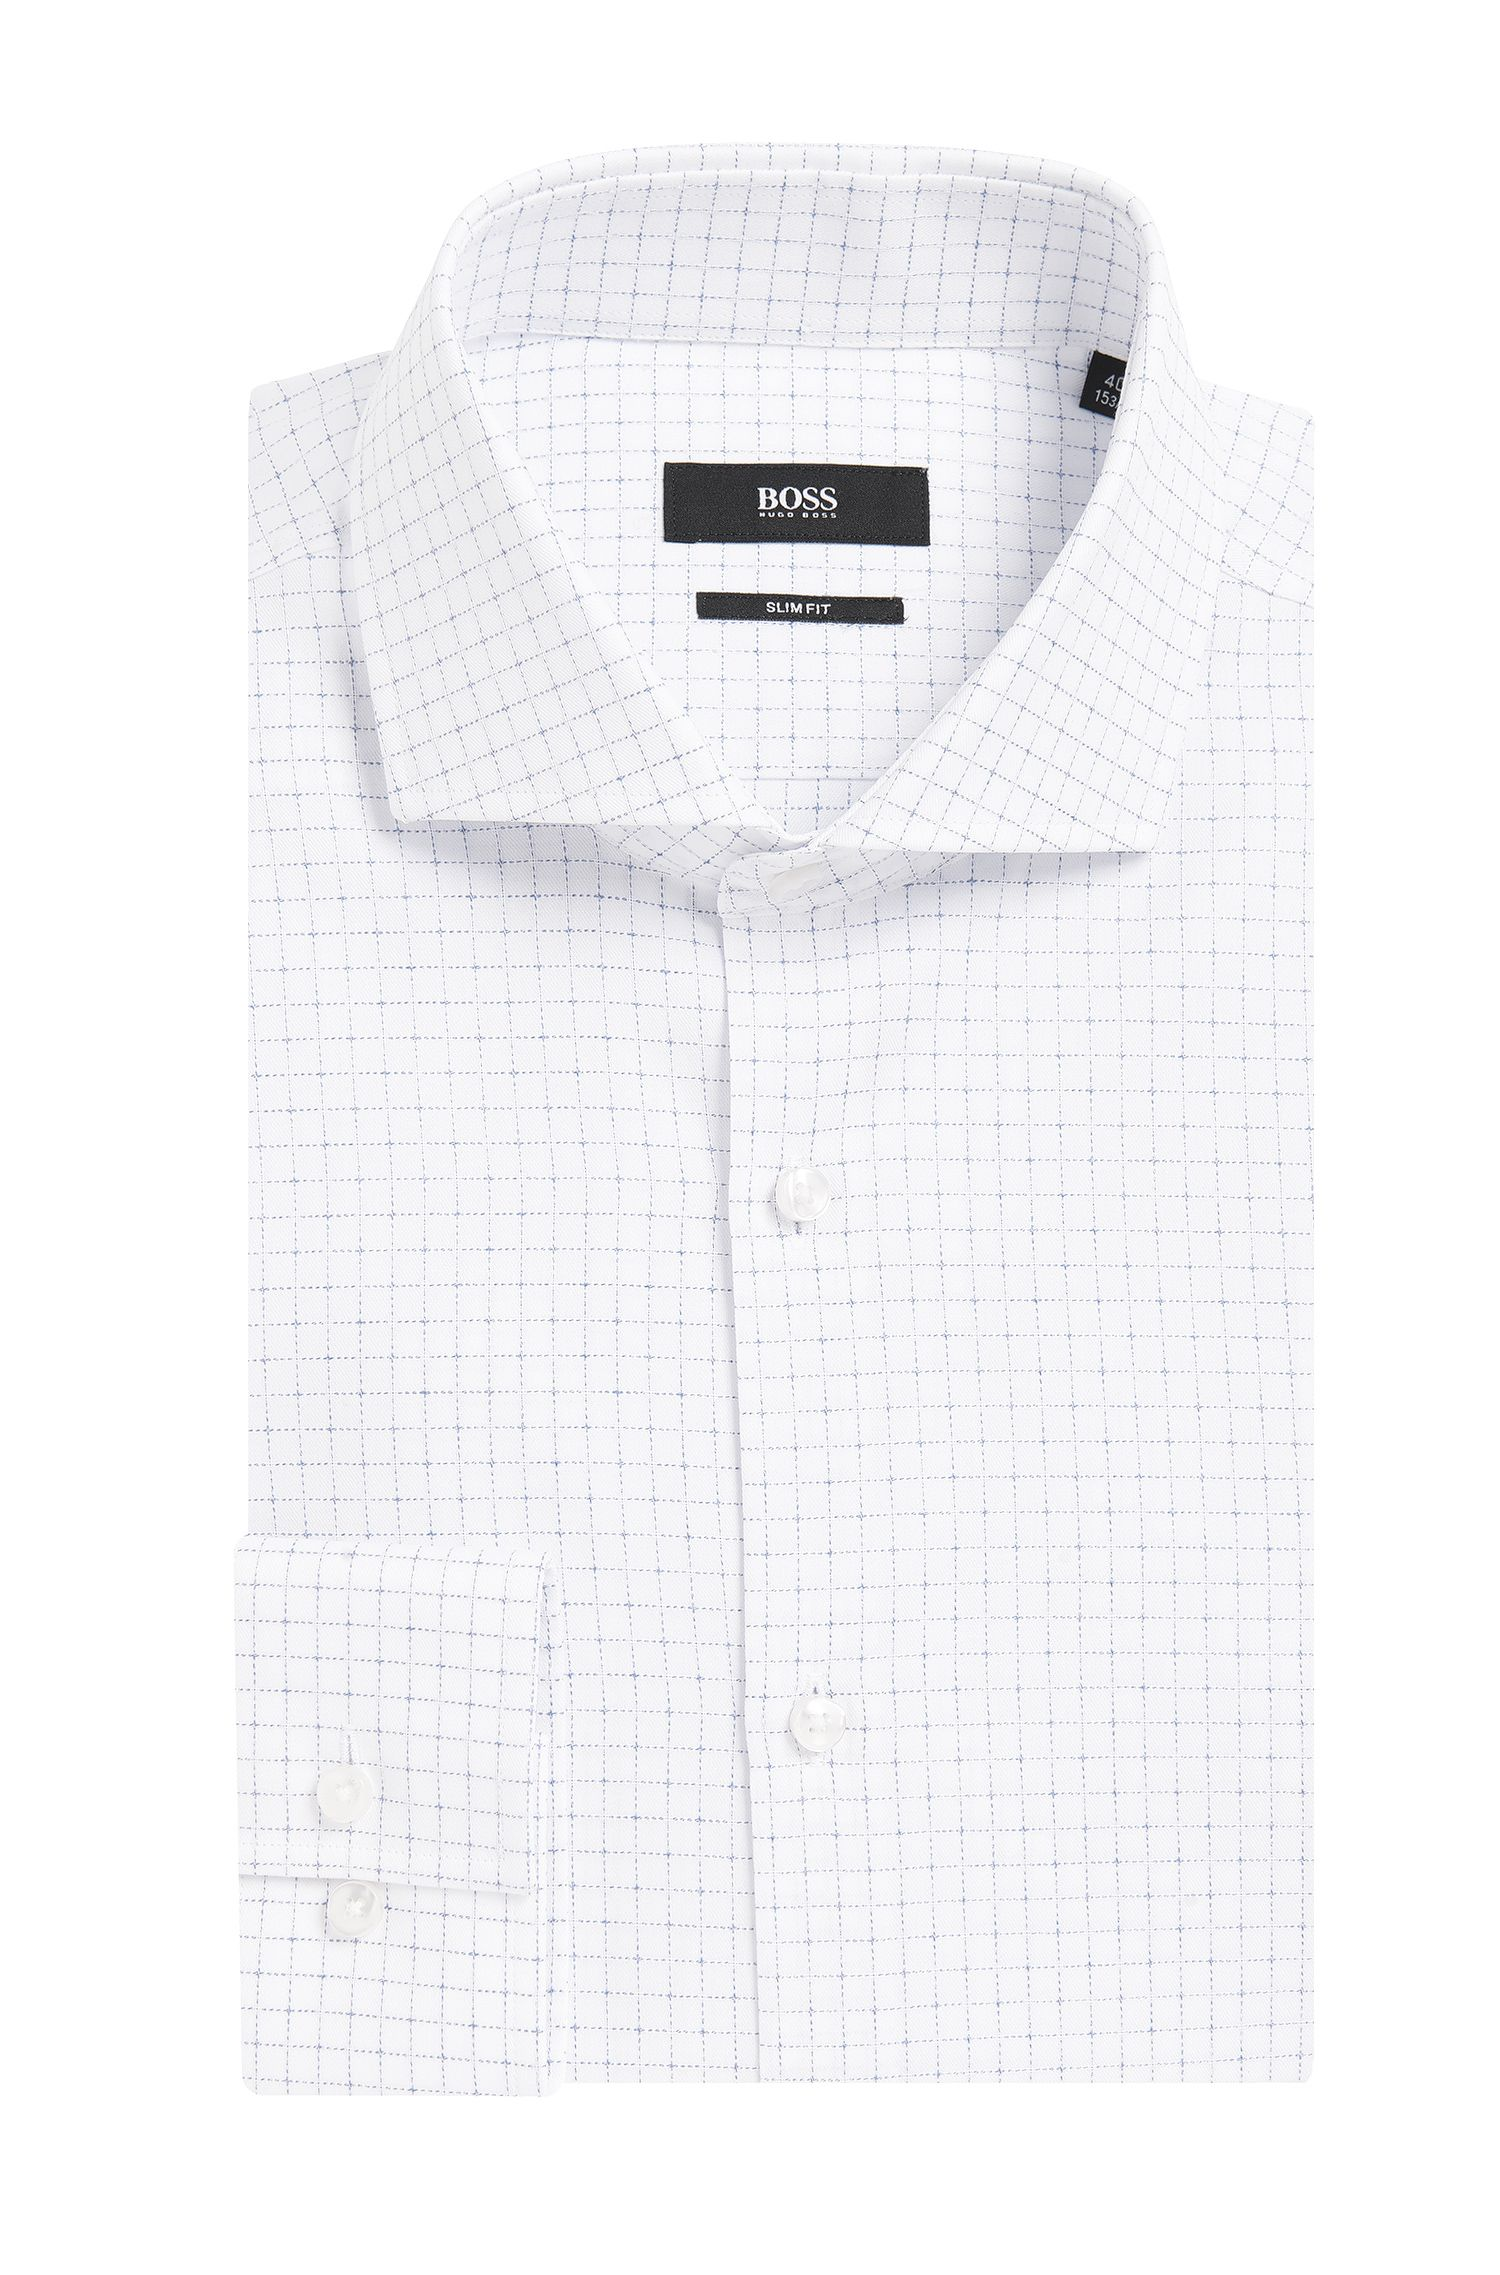 Grid Check Italian Cotton Dress Shirt, Slim Fit | Jason